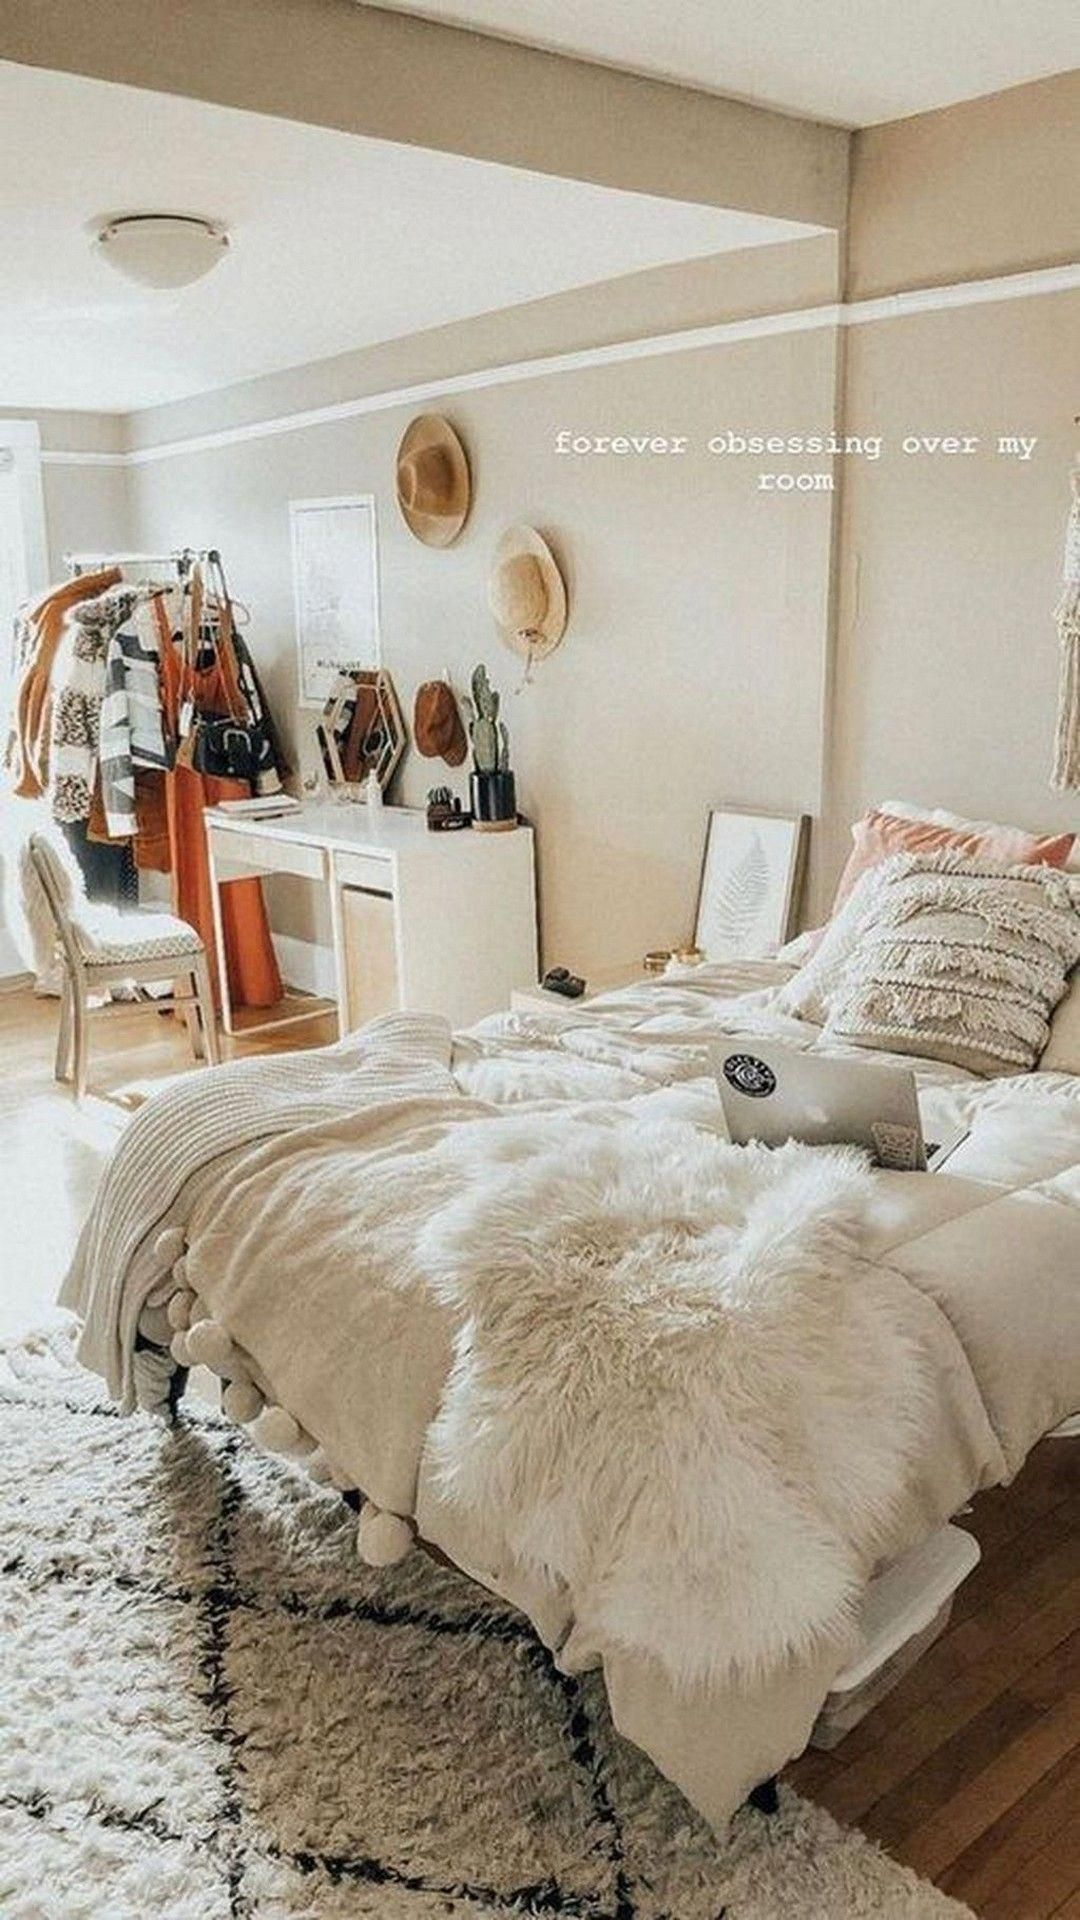 bedroominspo   Room inspiration, Minimalist bedroom design, Dream ...